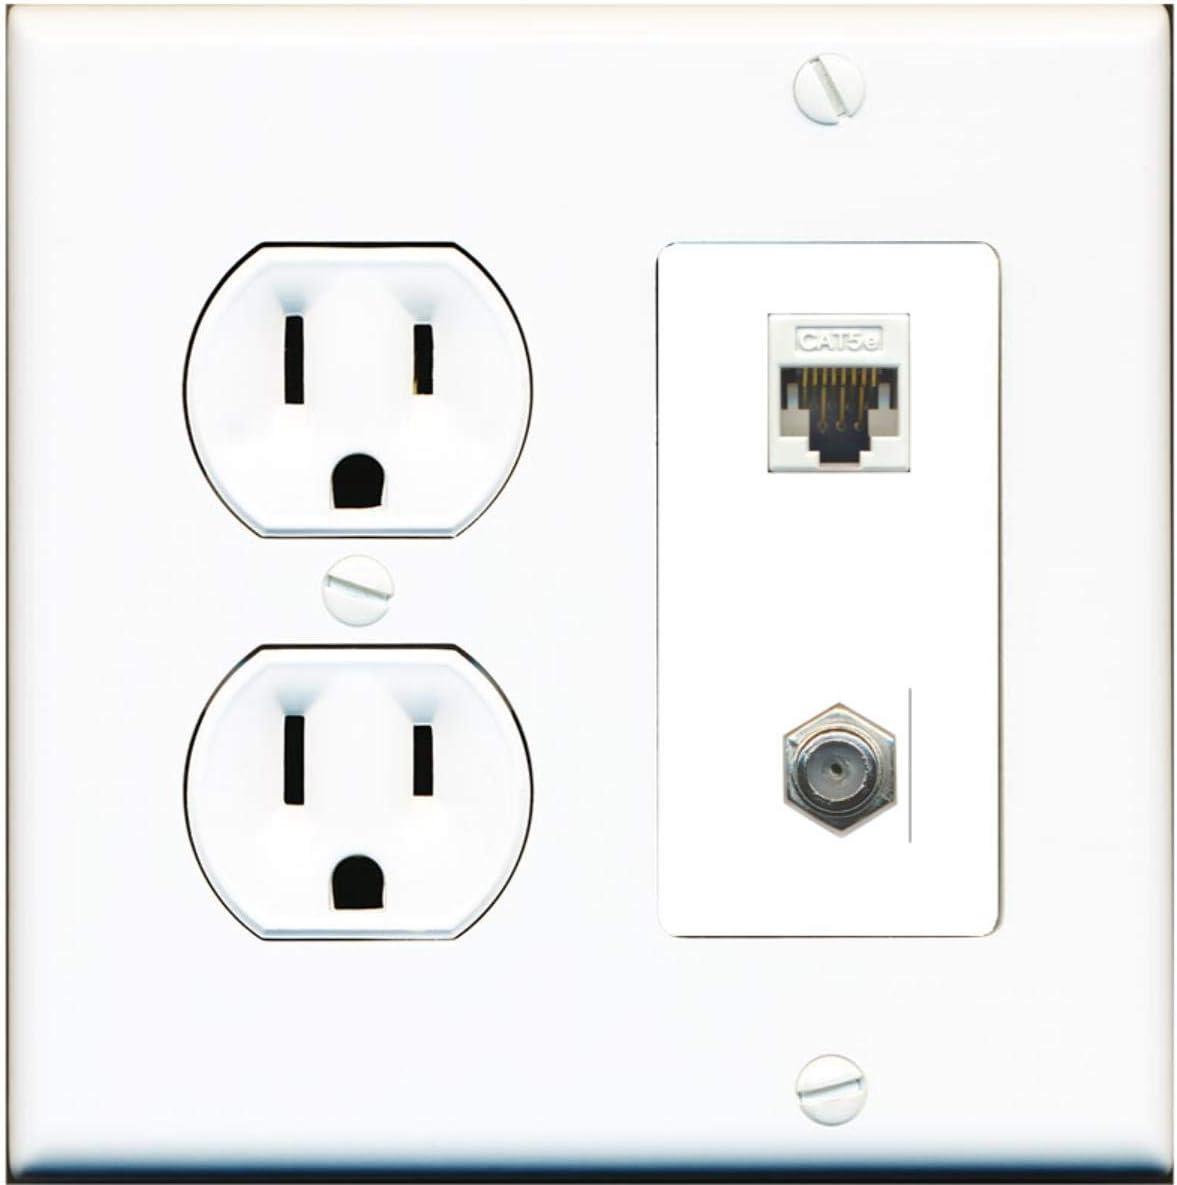 Excellent 15 Amp Round Power Outlet 1 Port Cable-TV Coax Ethernet cheap Cat5e